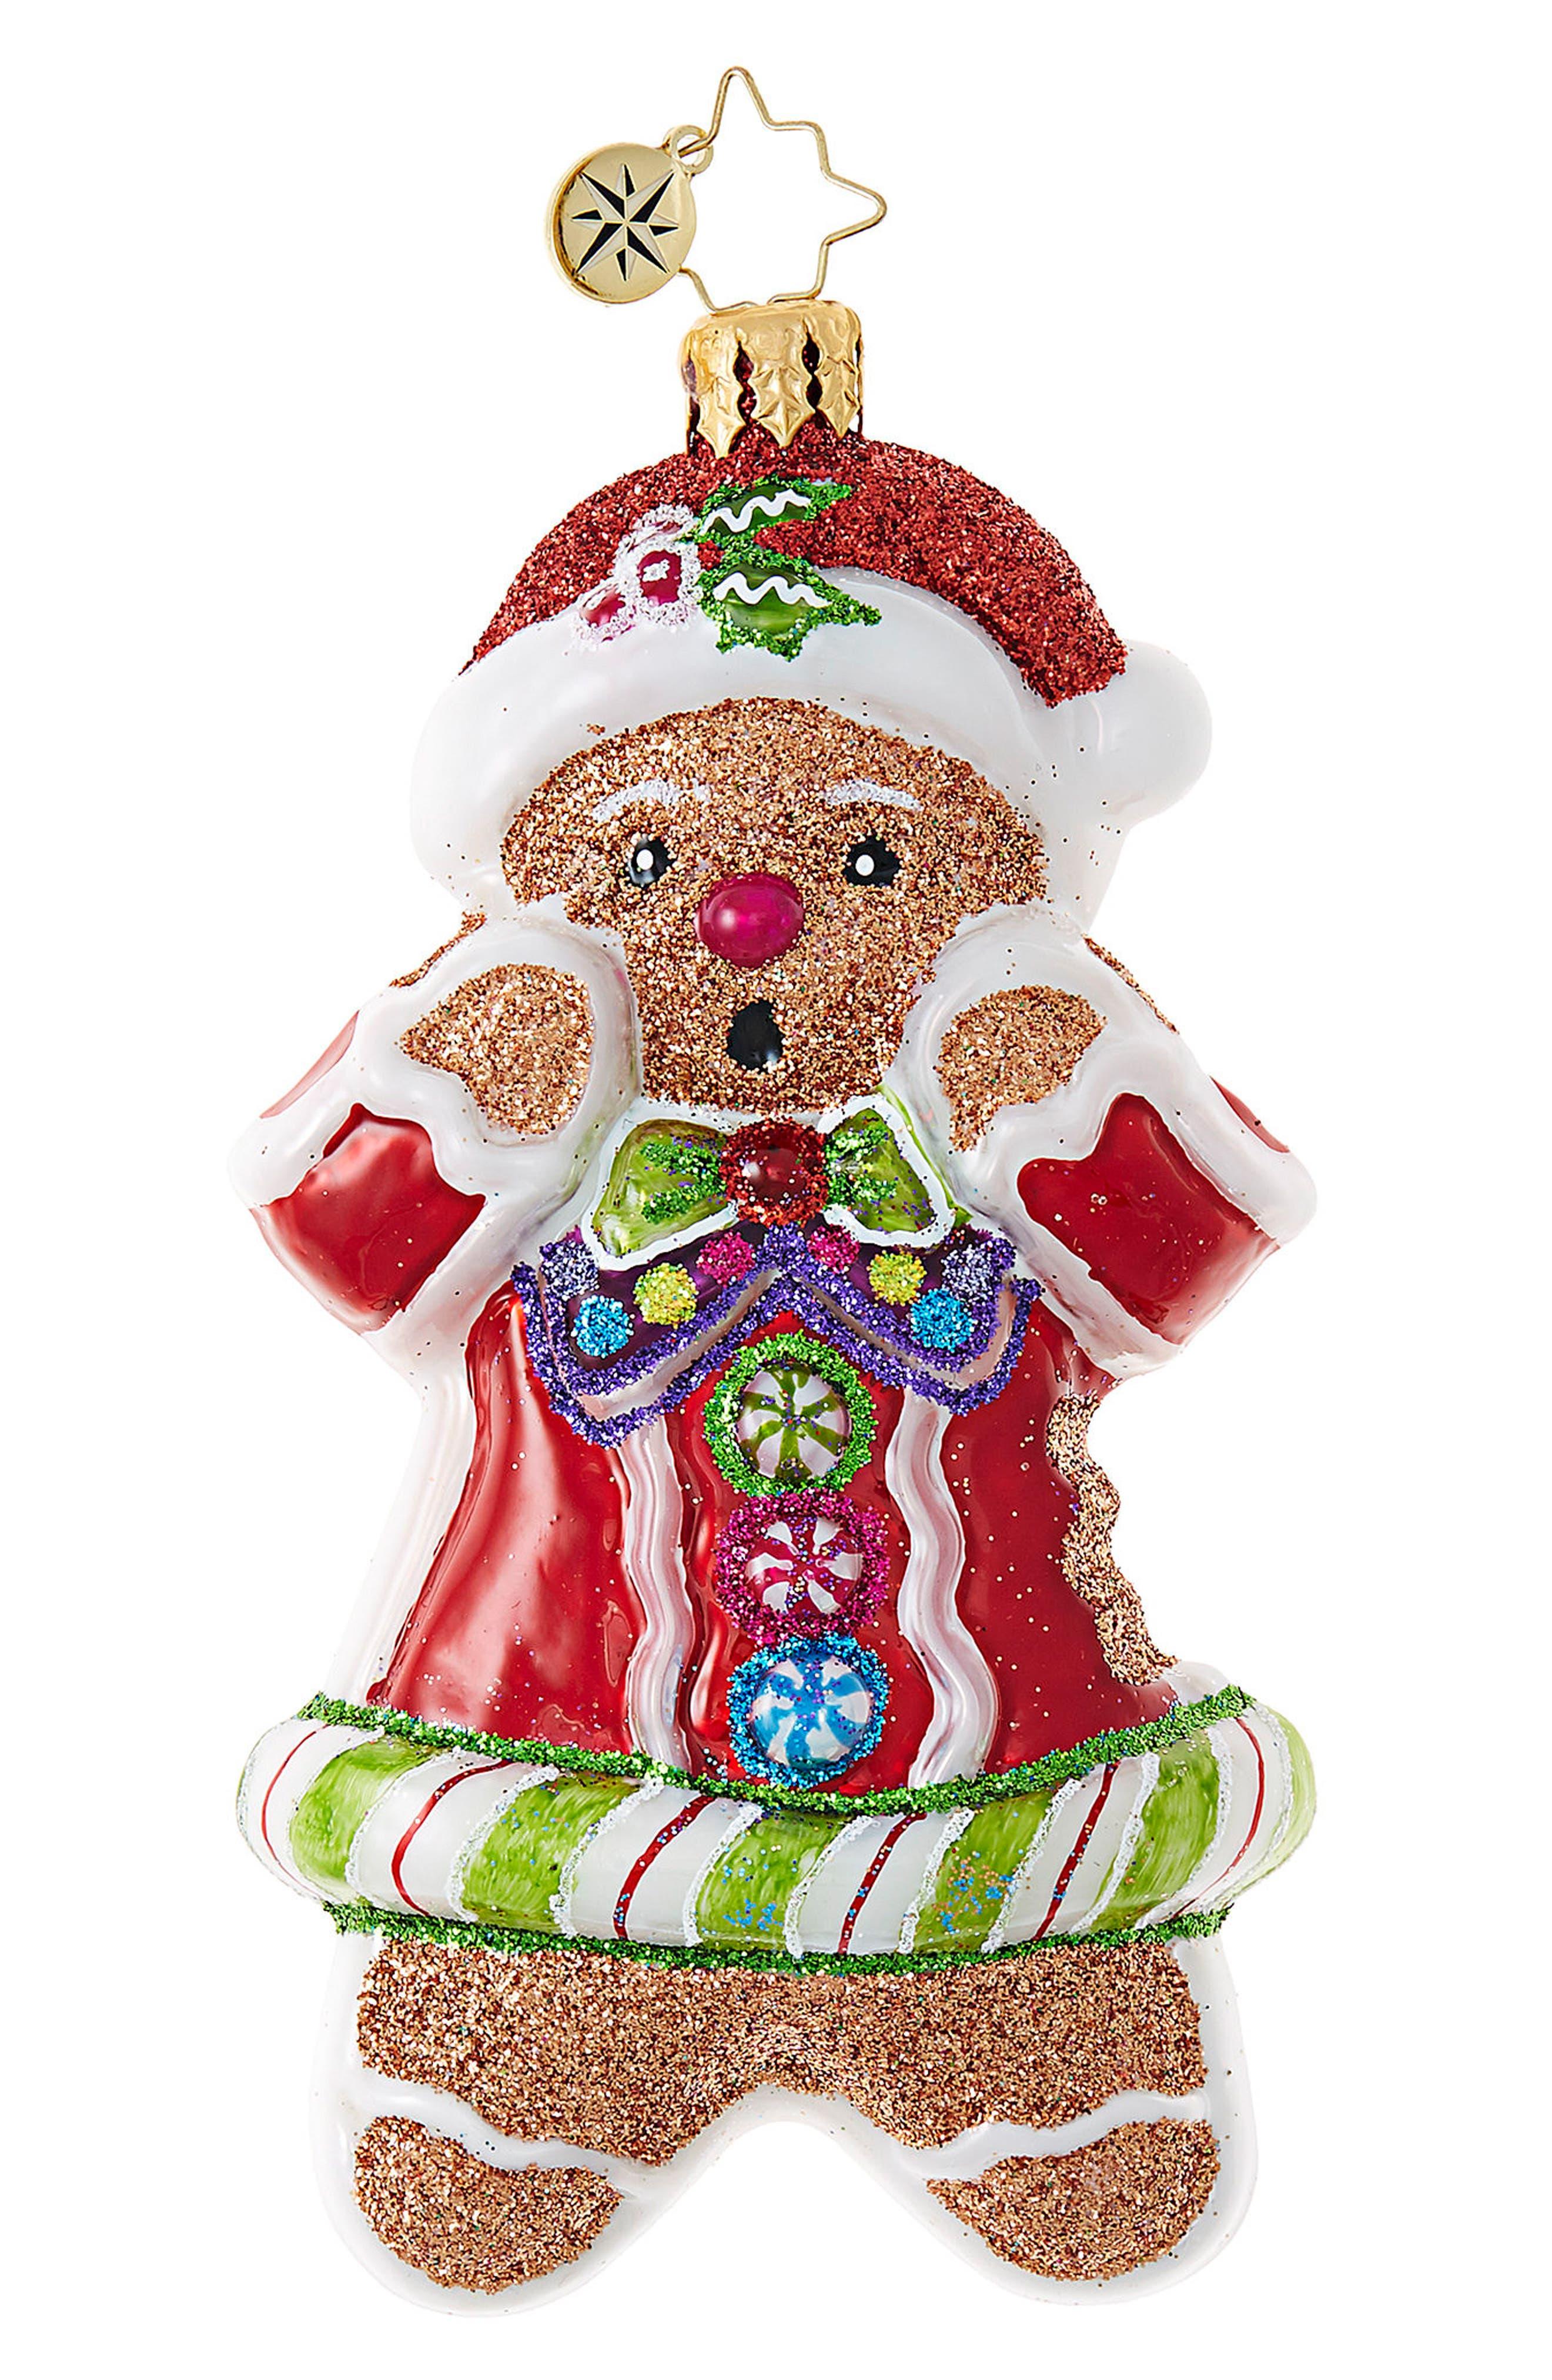 Christopher Radko Just One Bite Gingerbread Man Santa Claus Ornament